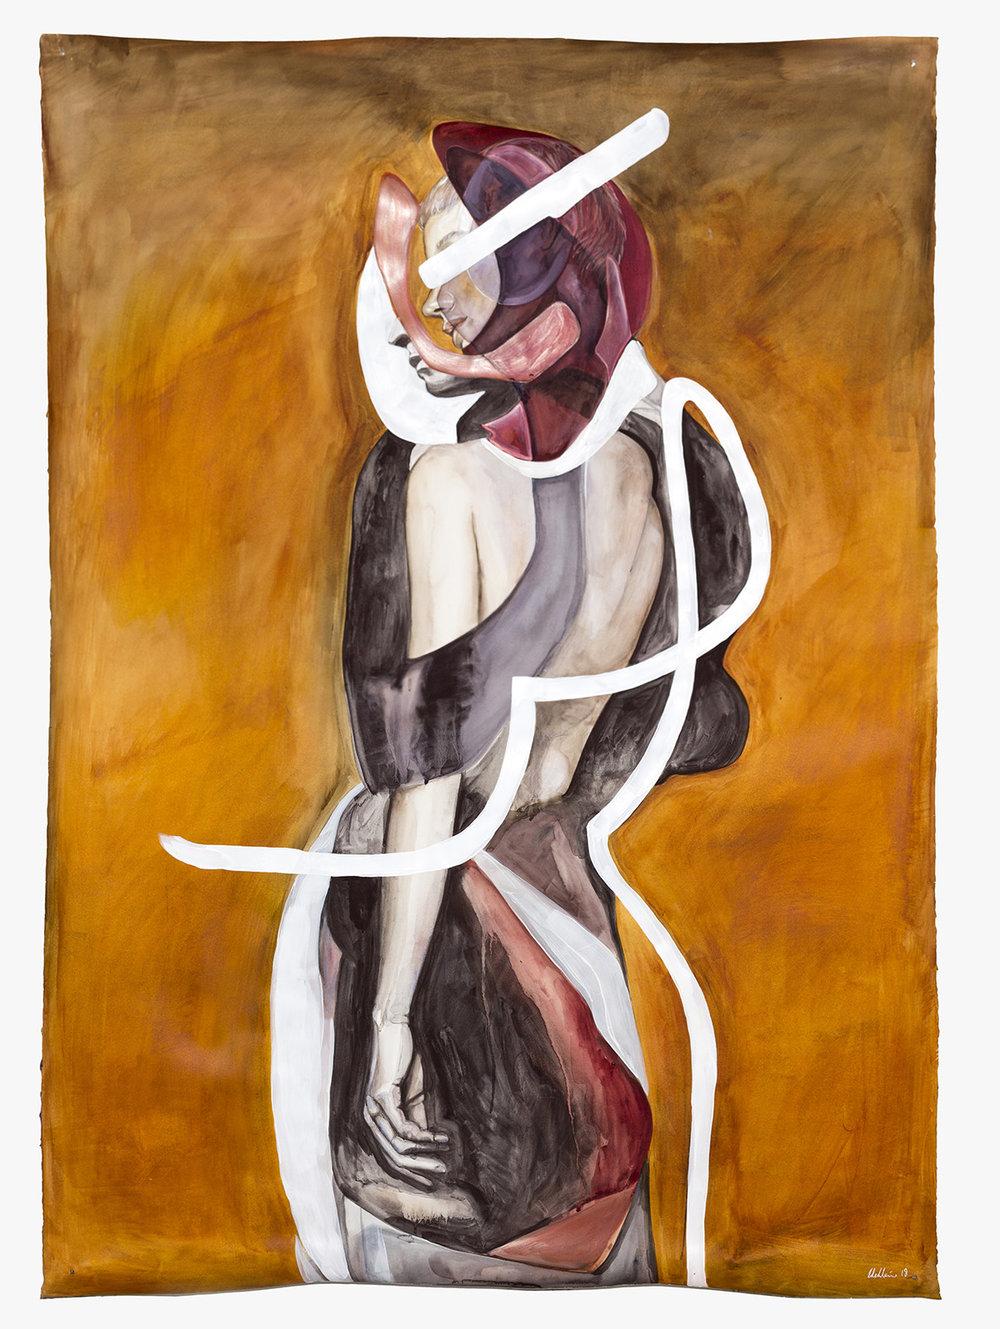 Bushfire  2018, 160 x 113cm, Watercolour, Gouache and Acrylic on Paper  SOLD